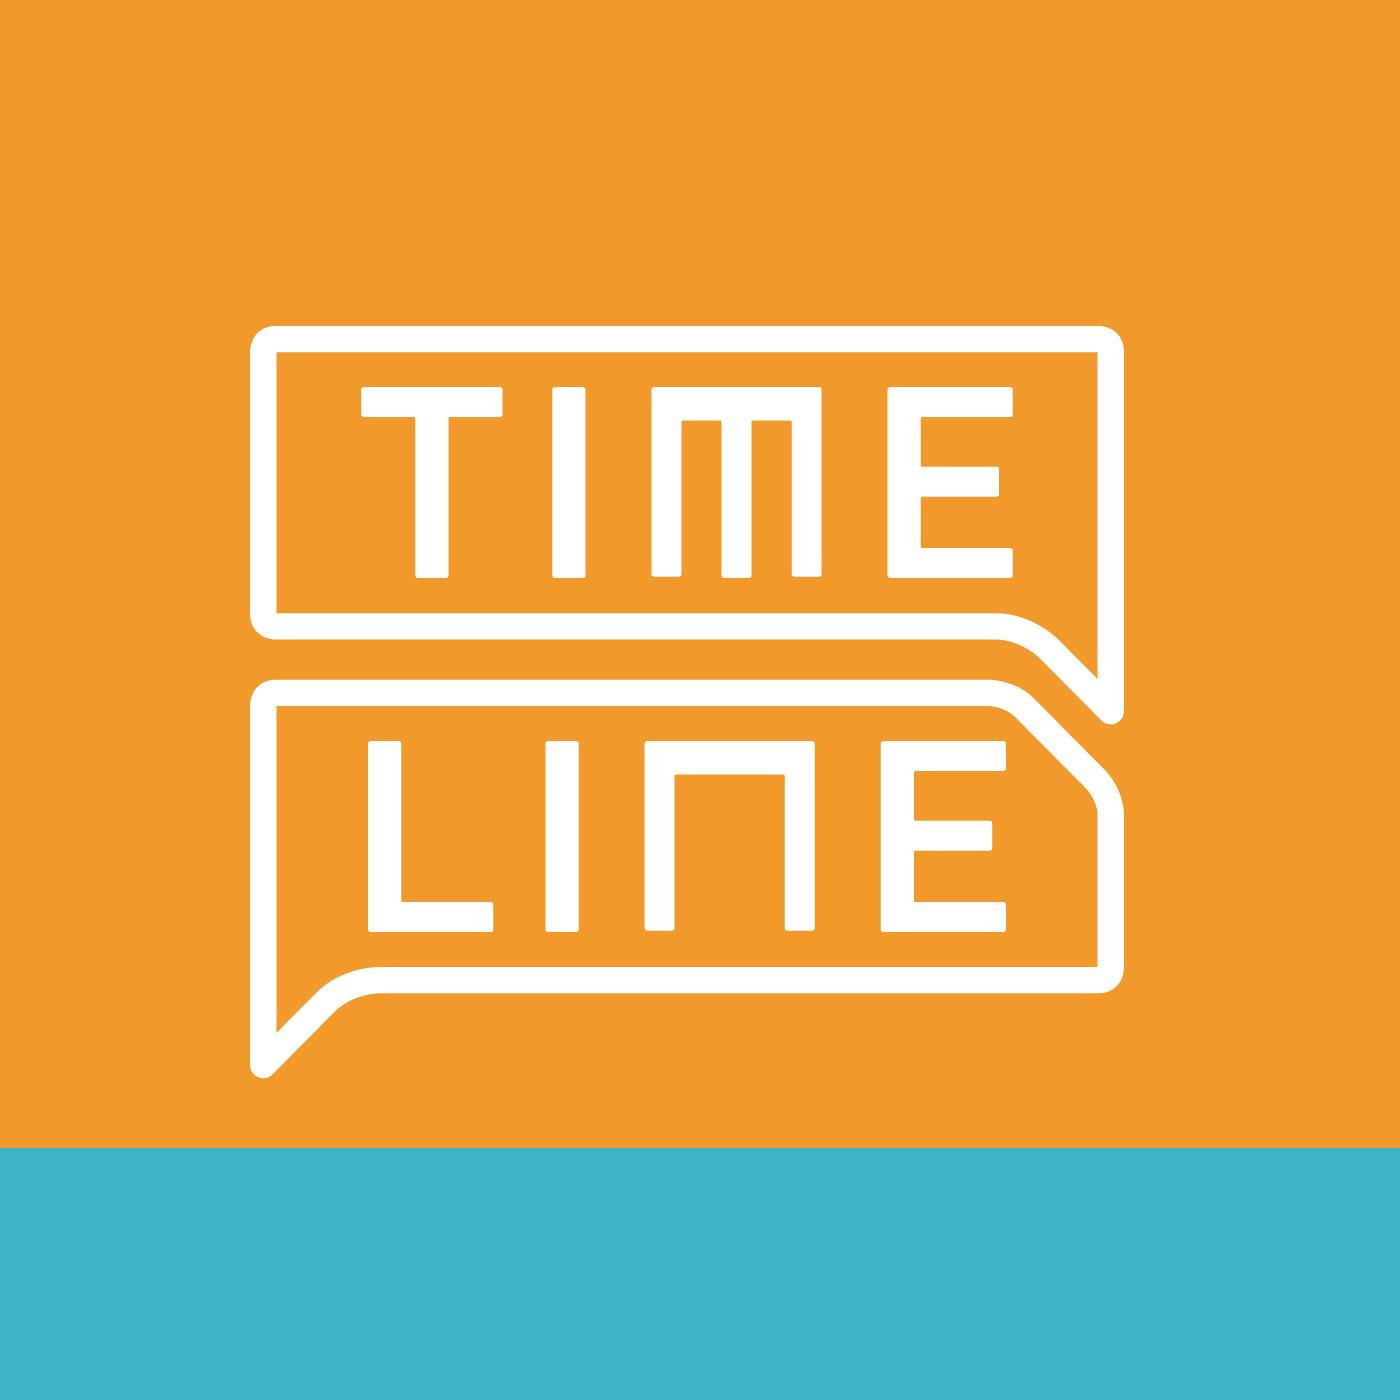 Timeline Gaúcha 16.03.2018